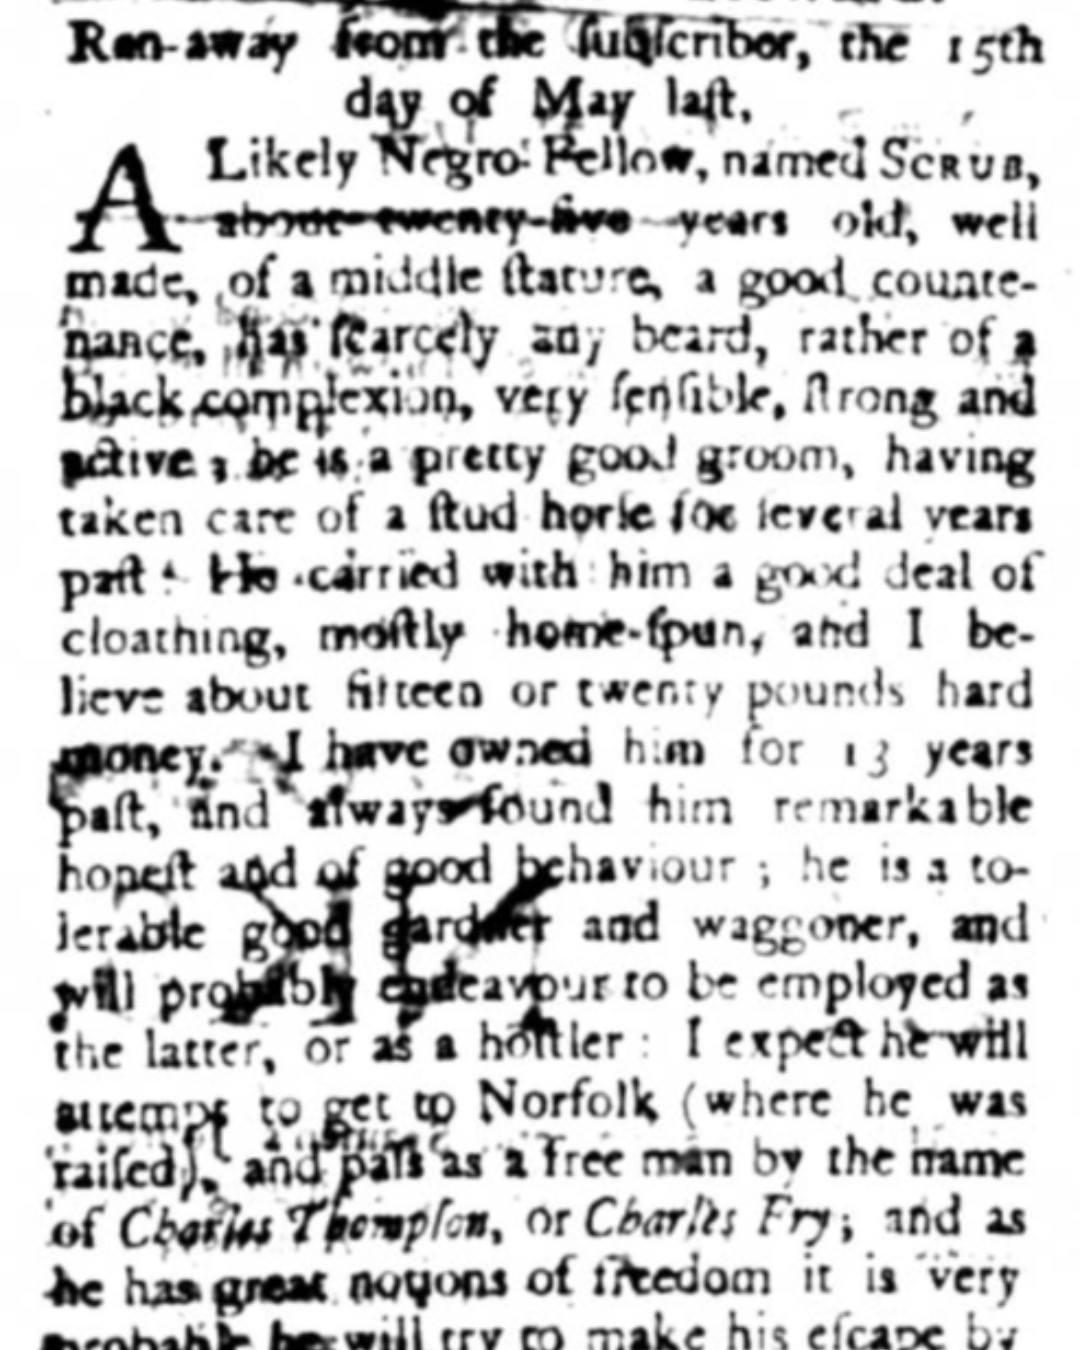 Newspaper advertisement seeking information about Scrub